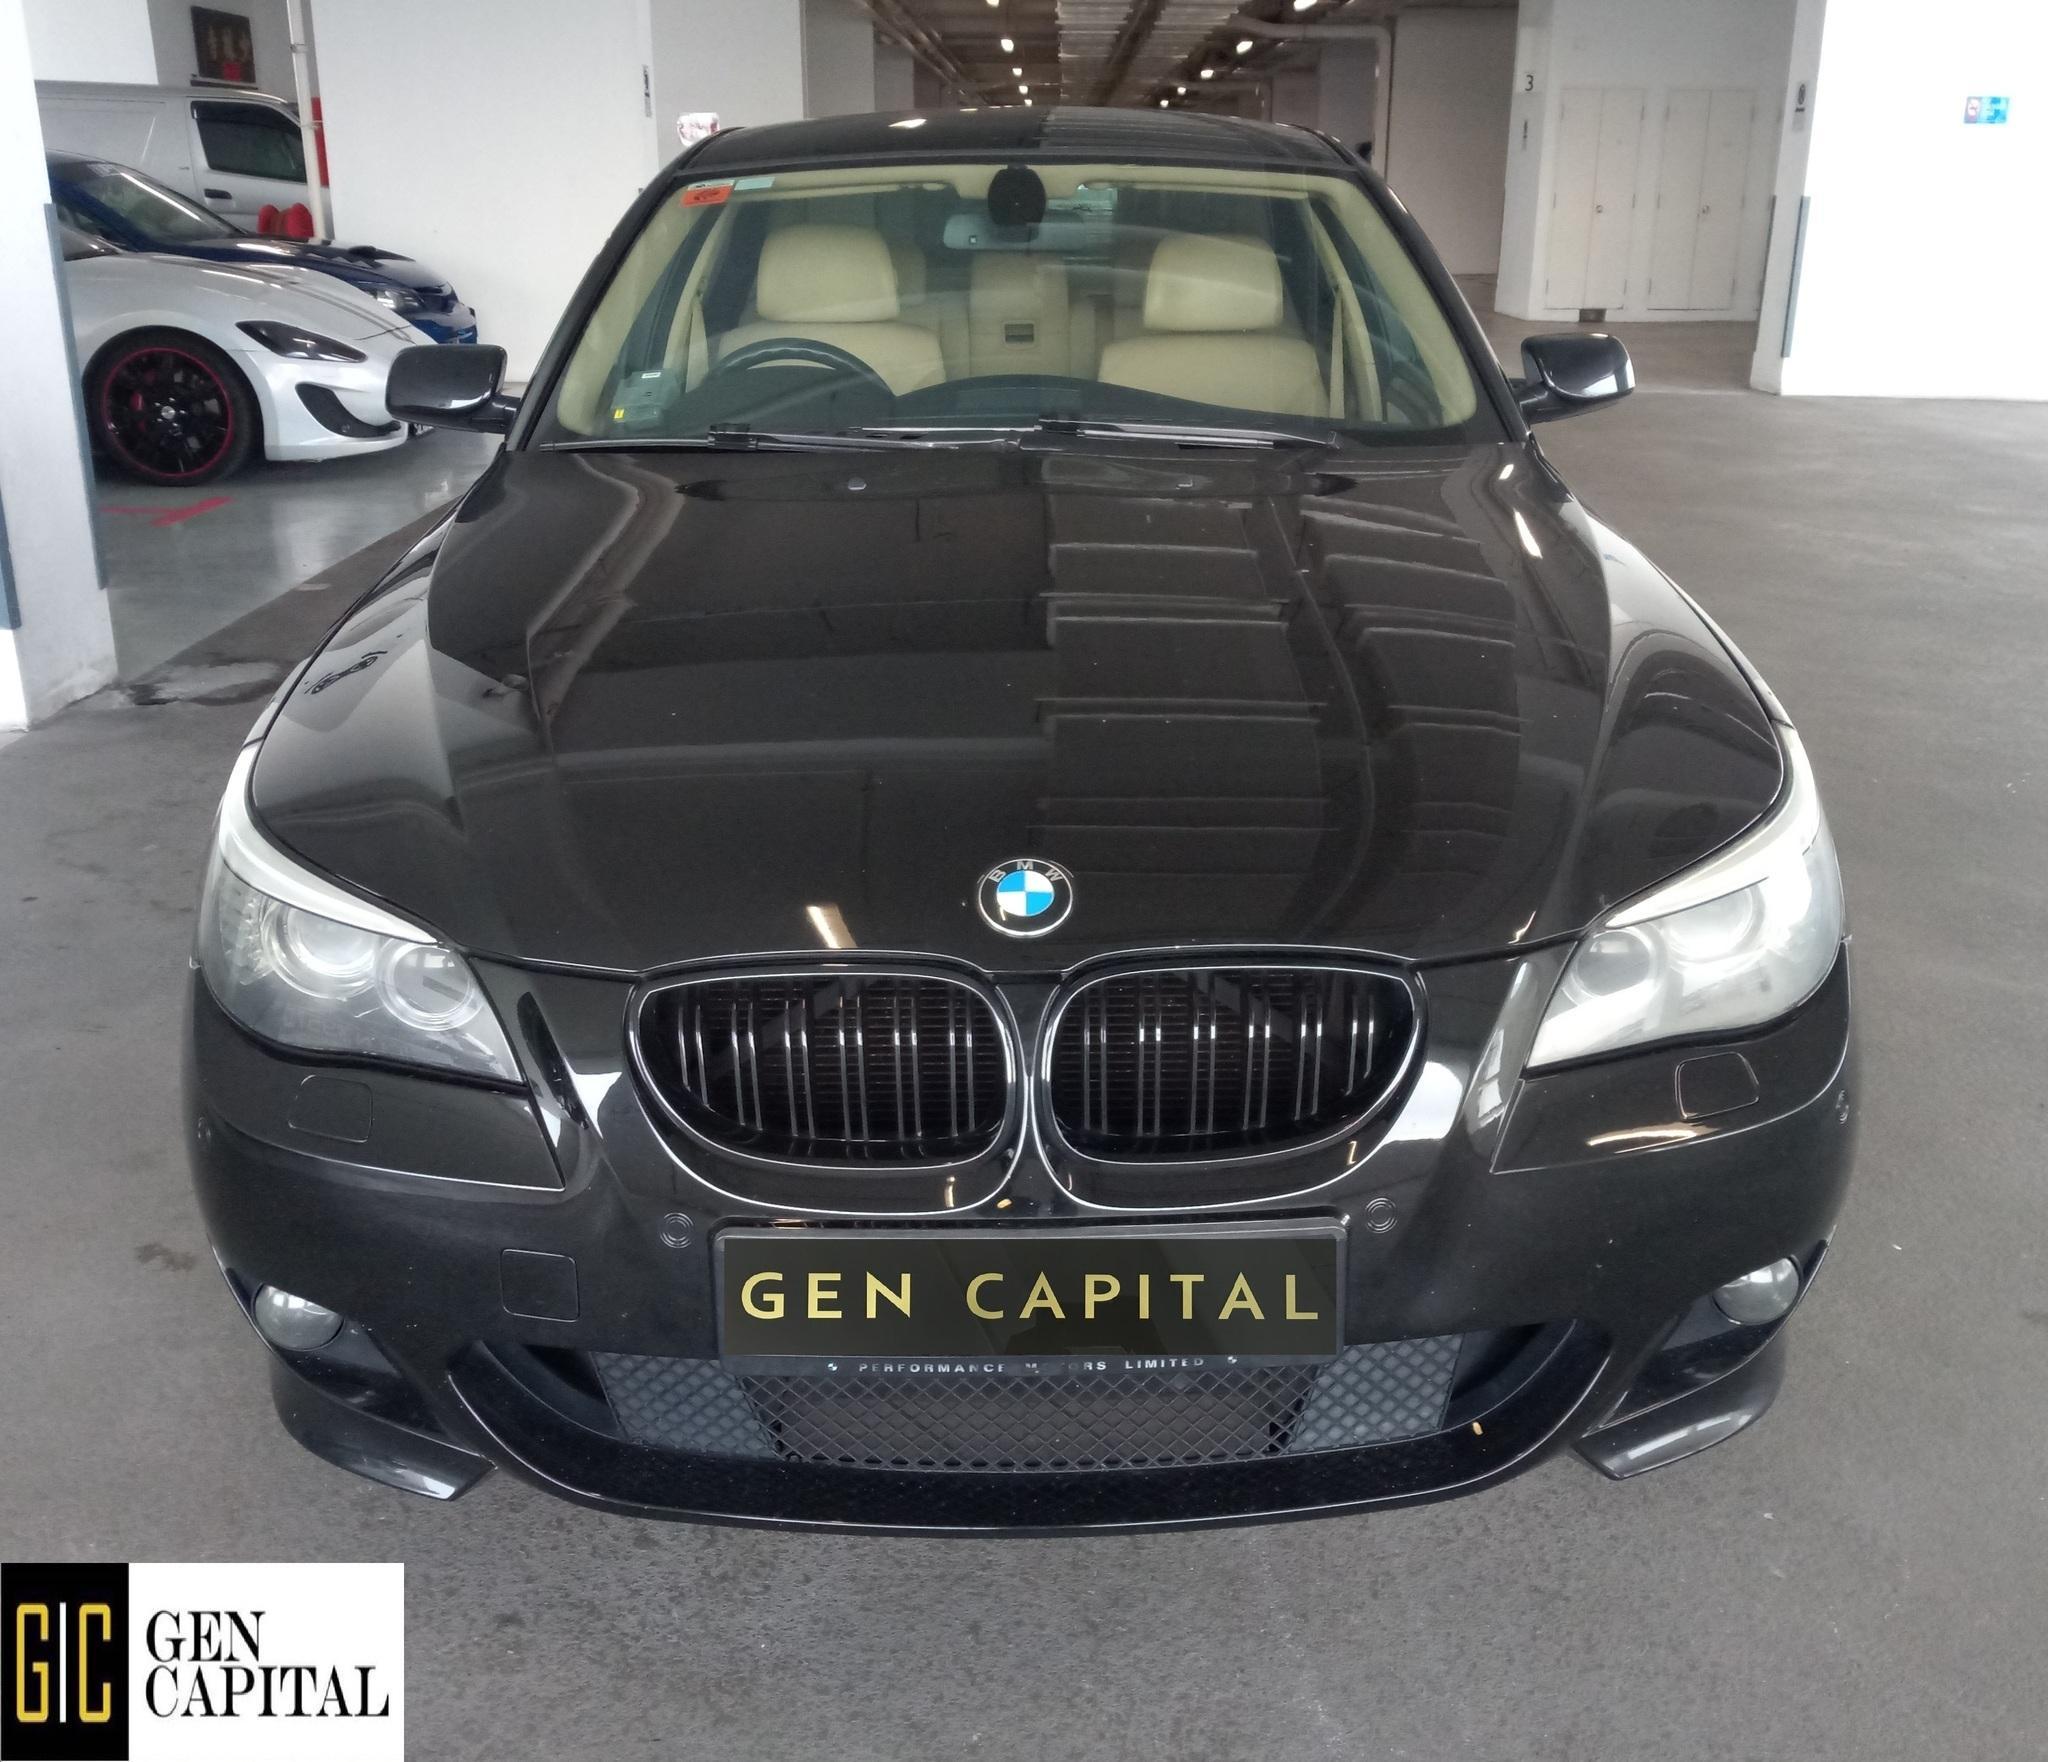 BMW 525i XL Luxury 2010  Sedan for Personal/Family Use